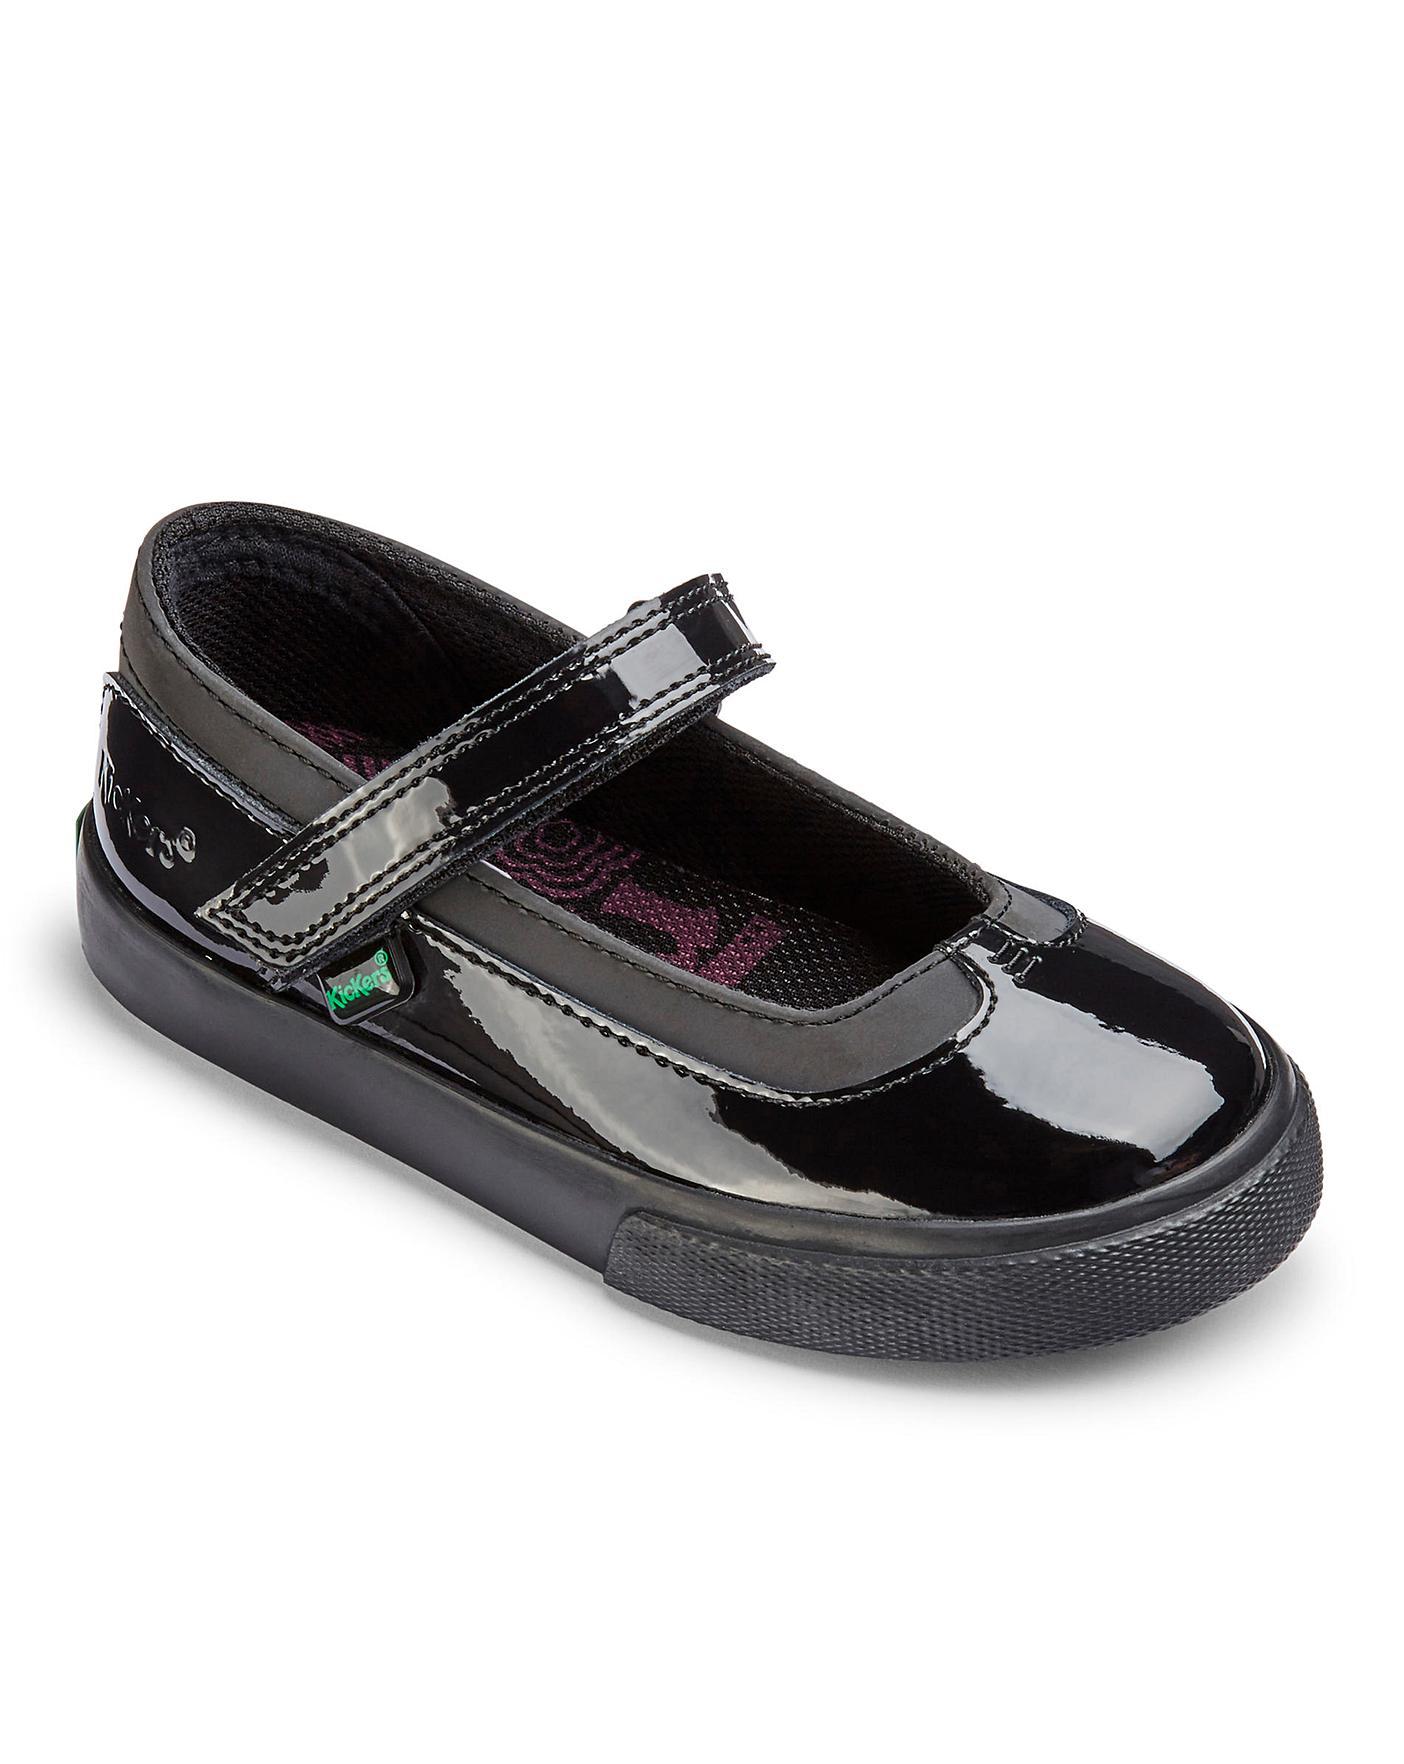 Kickers Tovni Mary Jane Patent Shoe